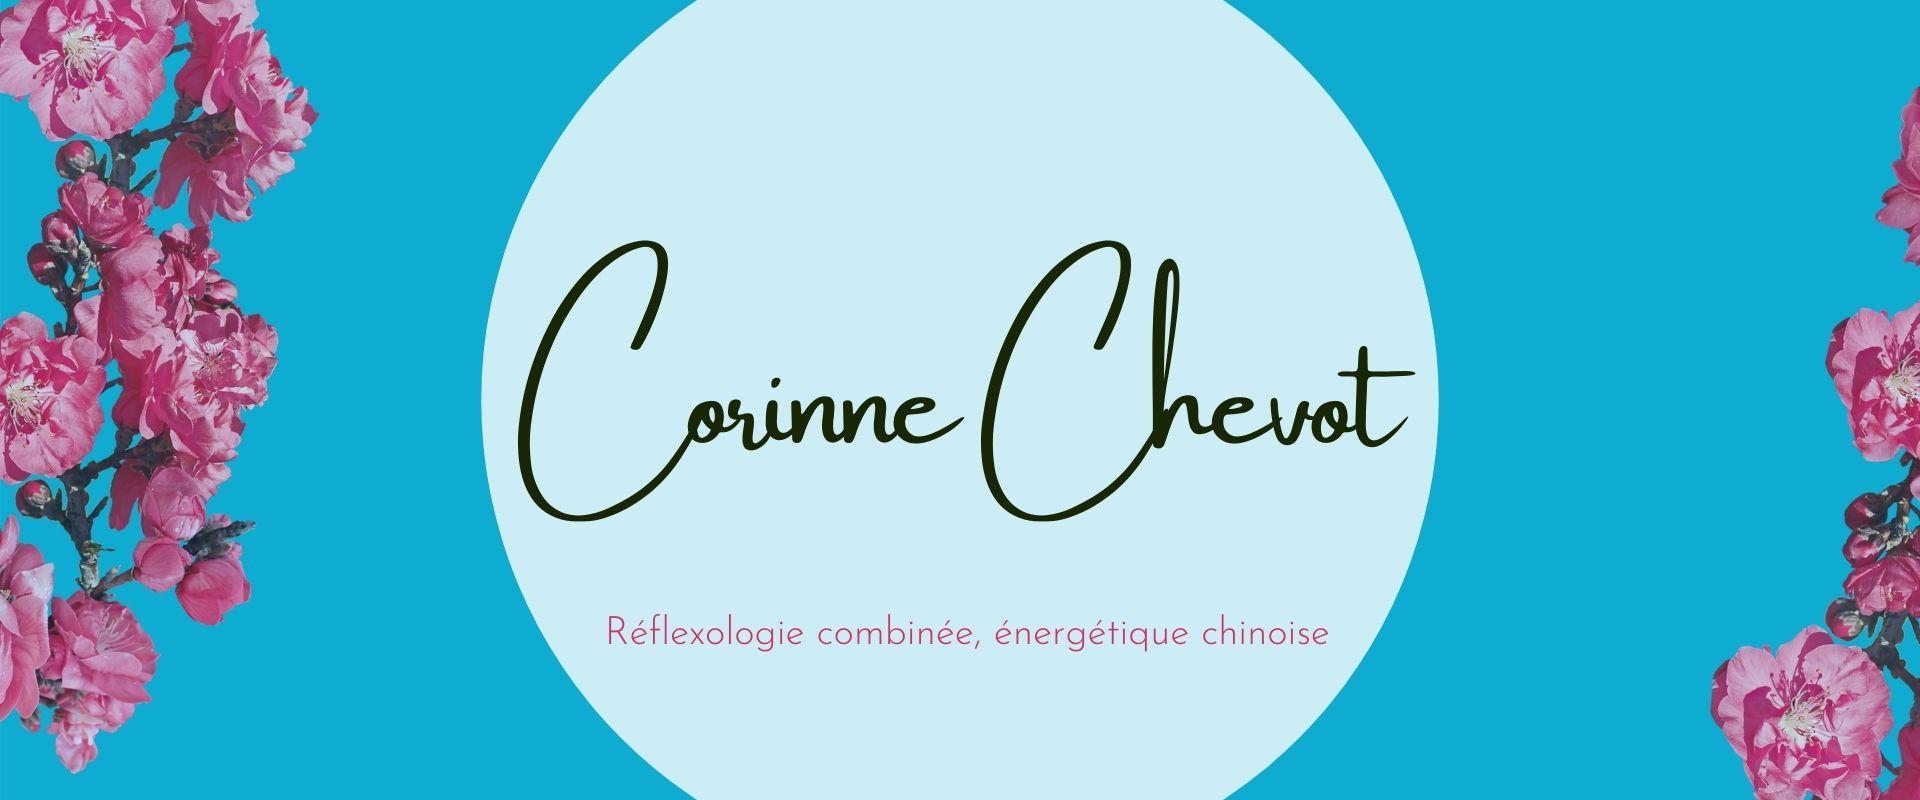 Corinne Chevot, réflexologue certifiée